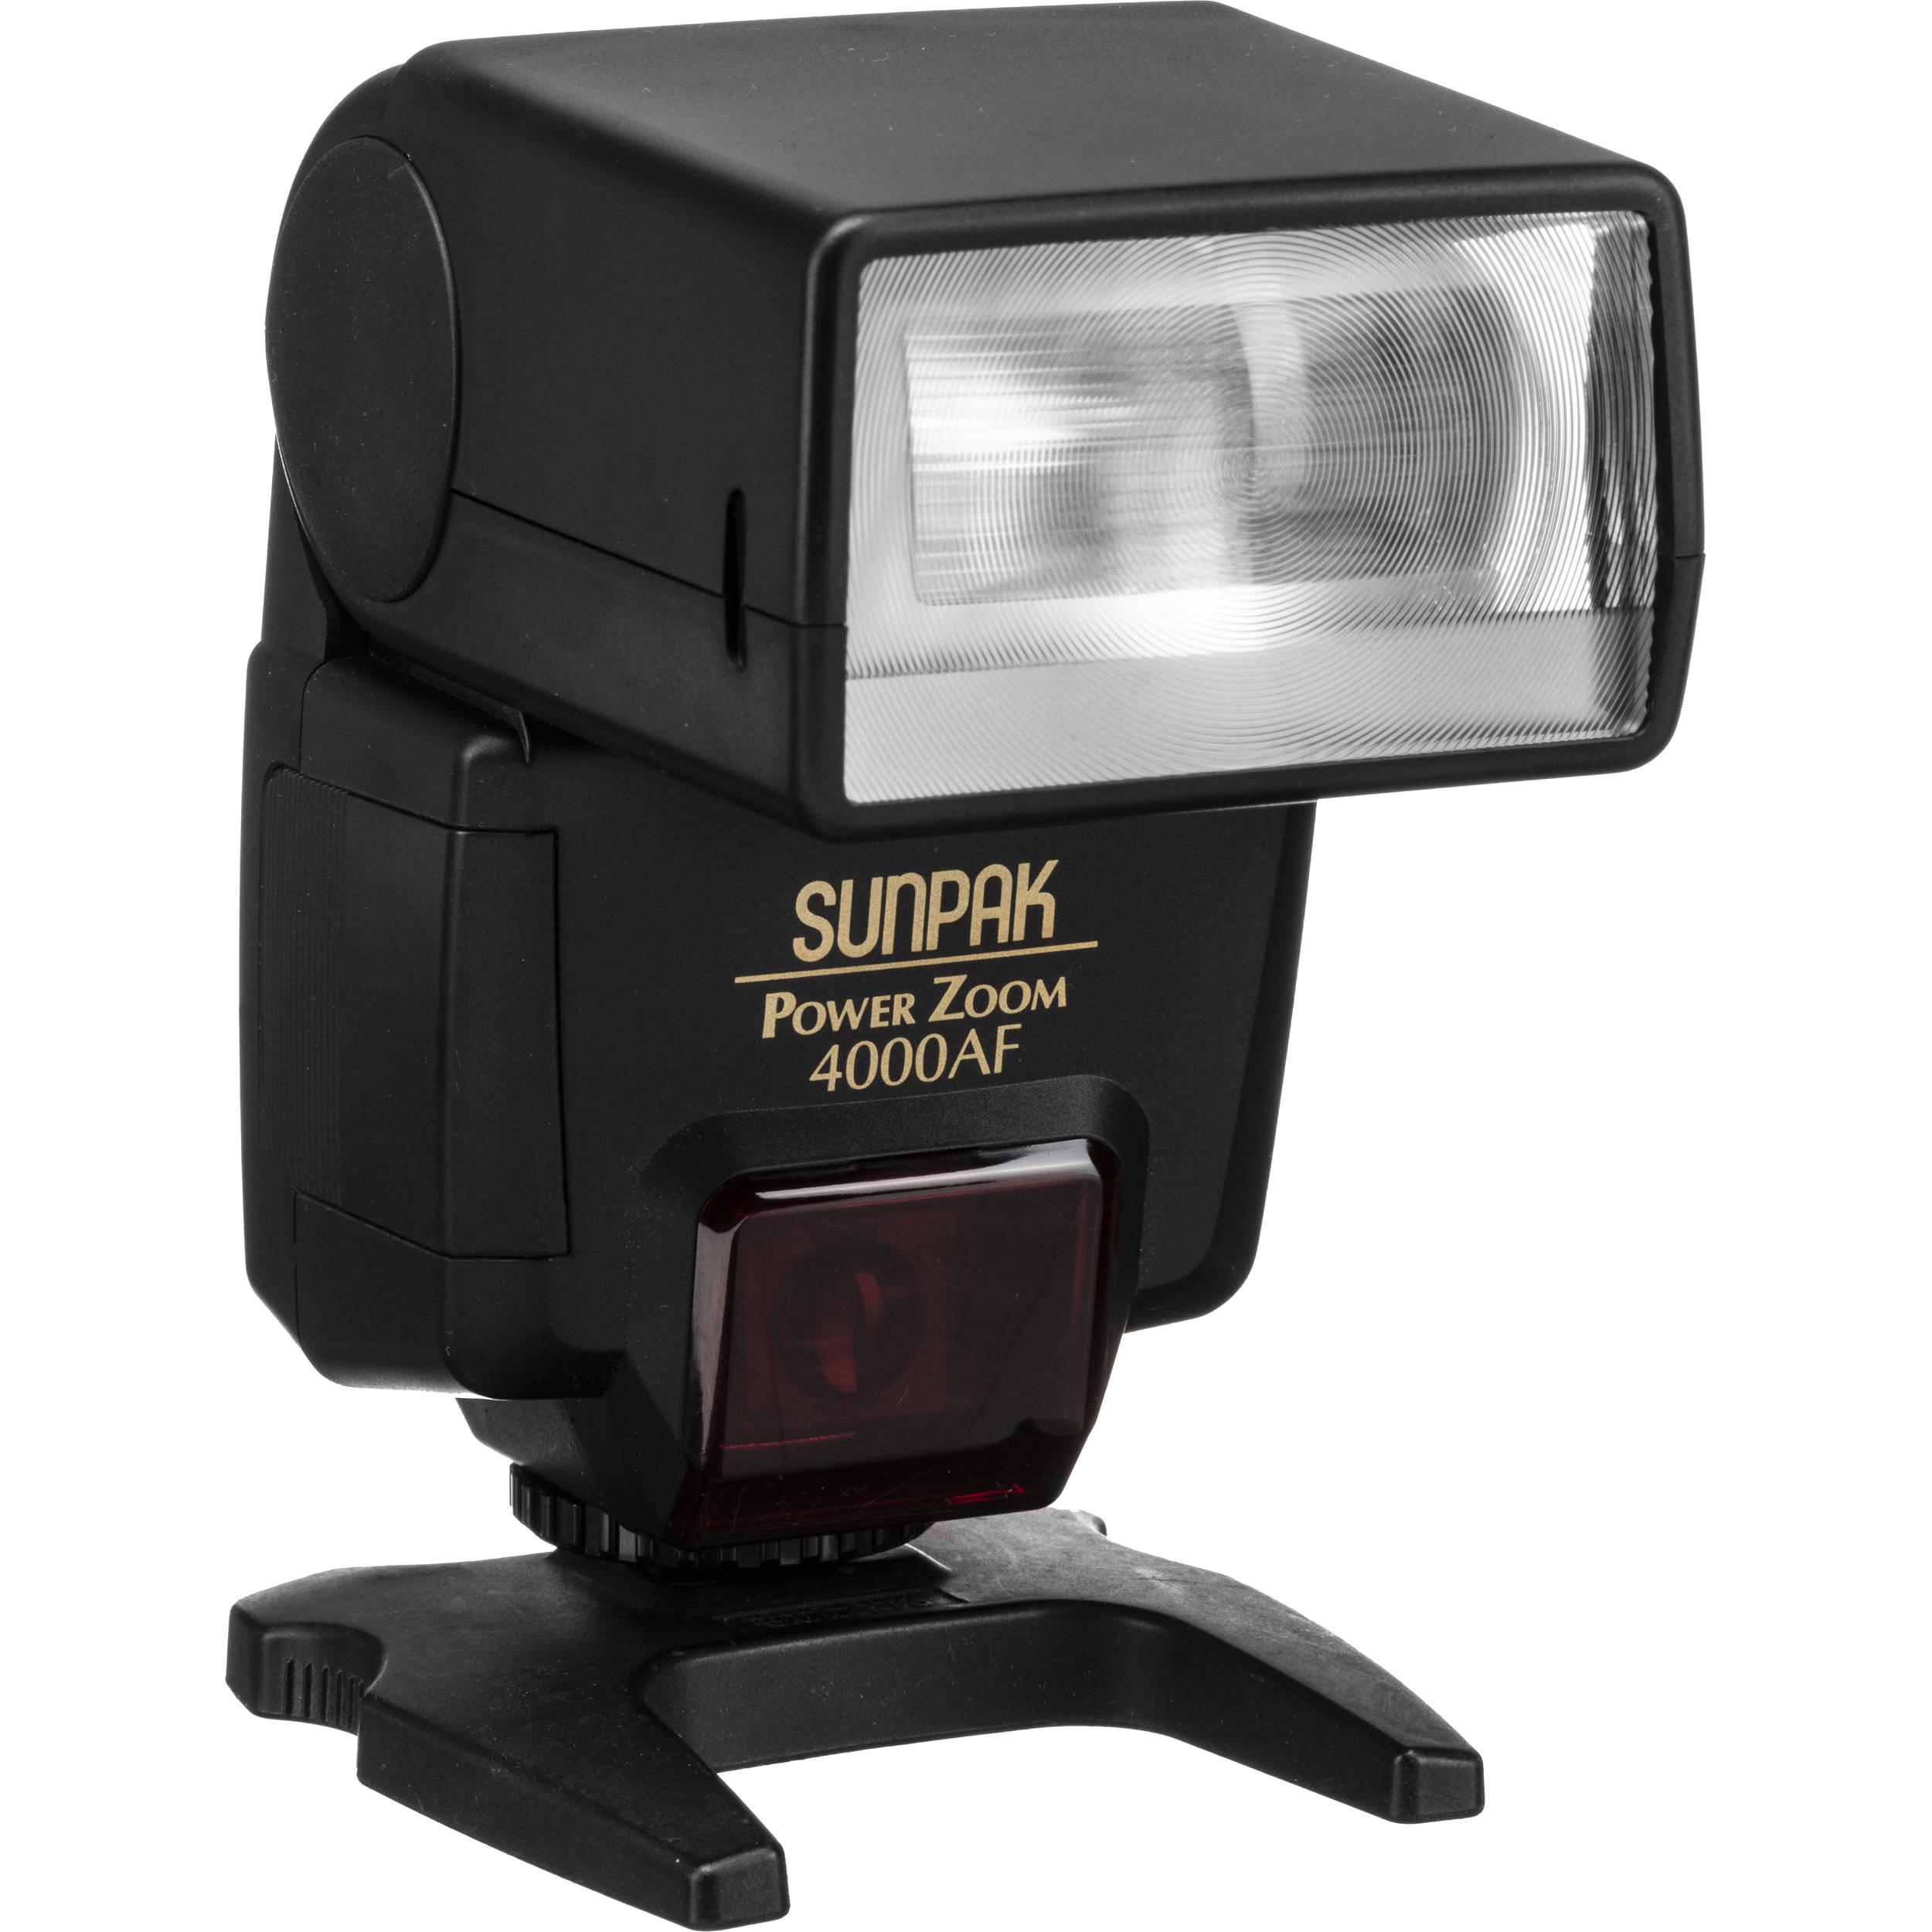 Impact Strobros Globe Diffuser for On Camera Flash